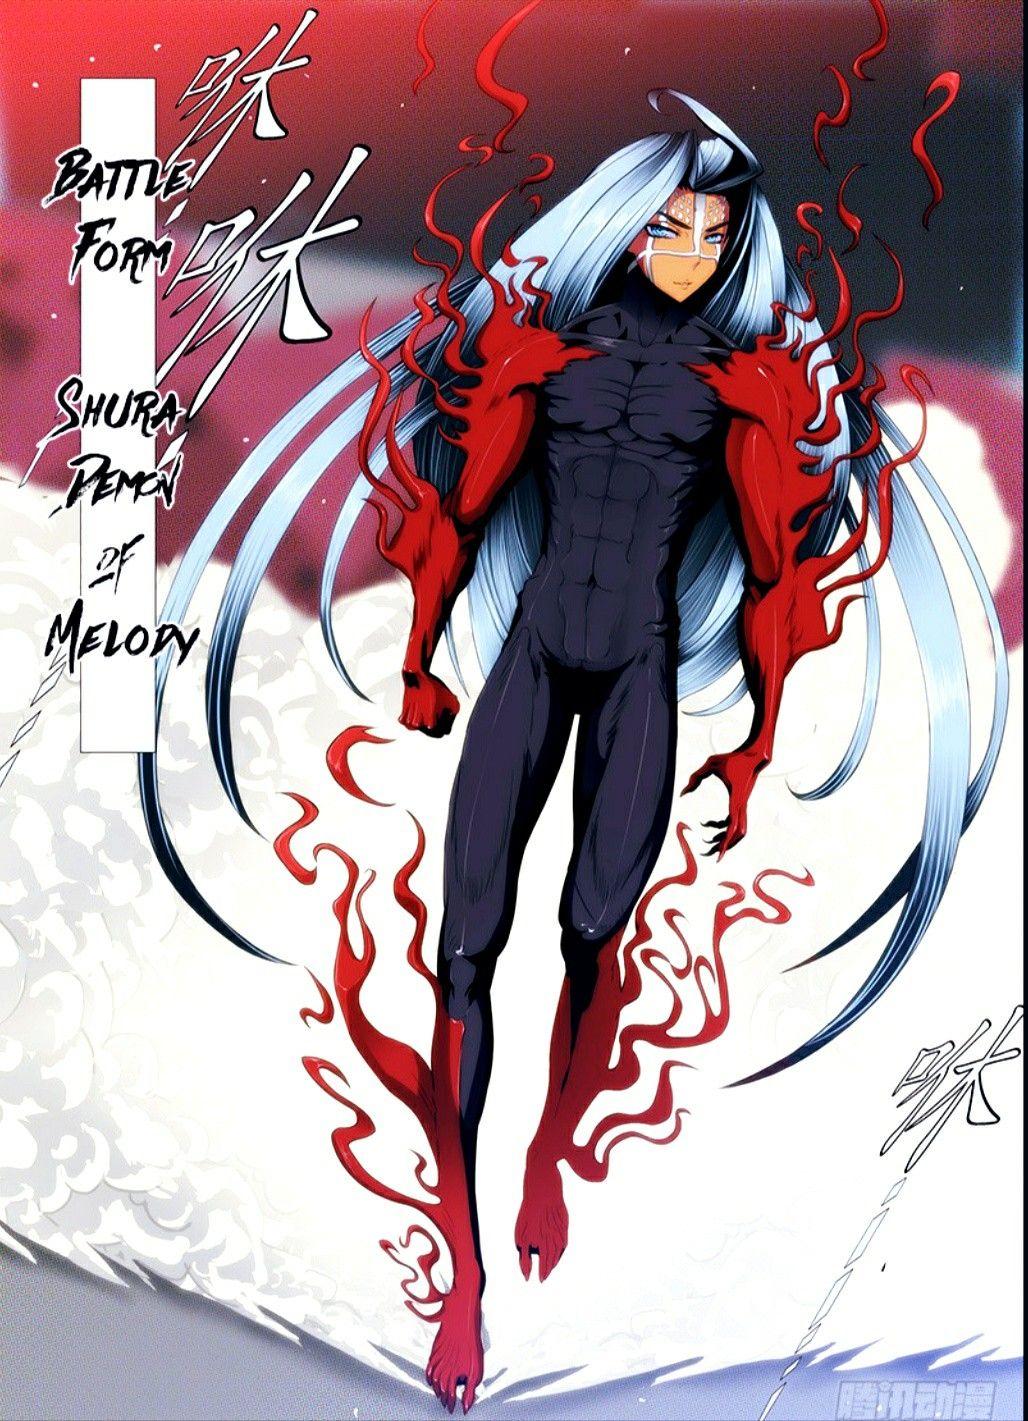 Lookin' mightyfine in 2020 Manga, Fantasy character